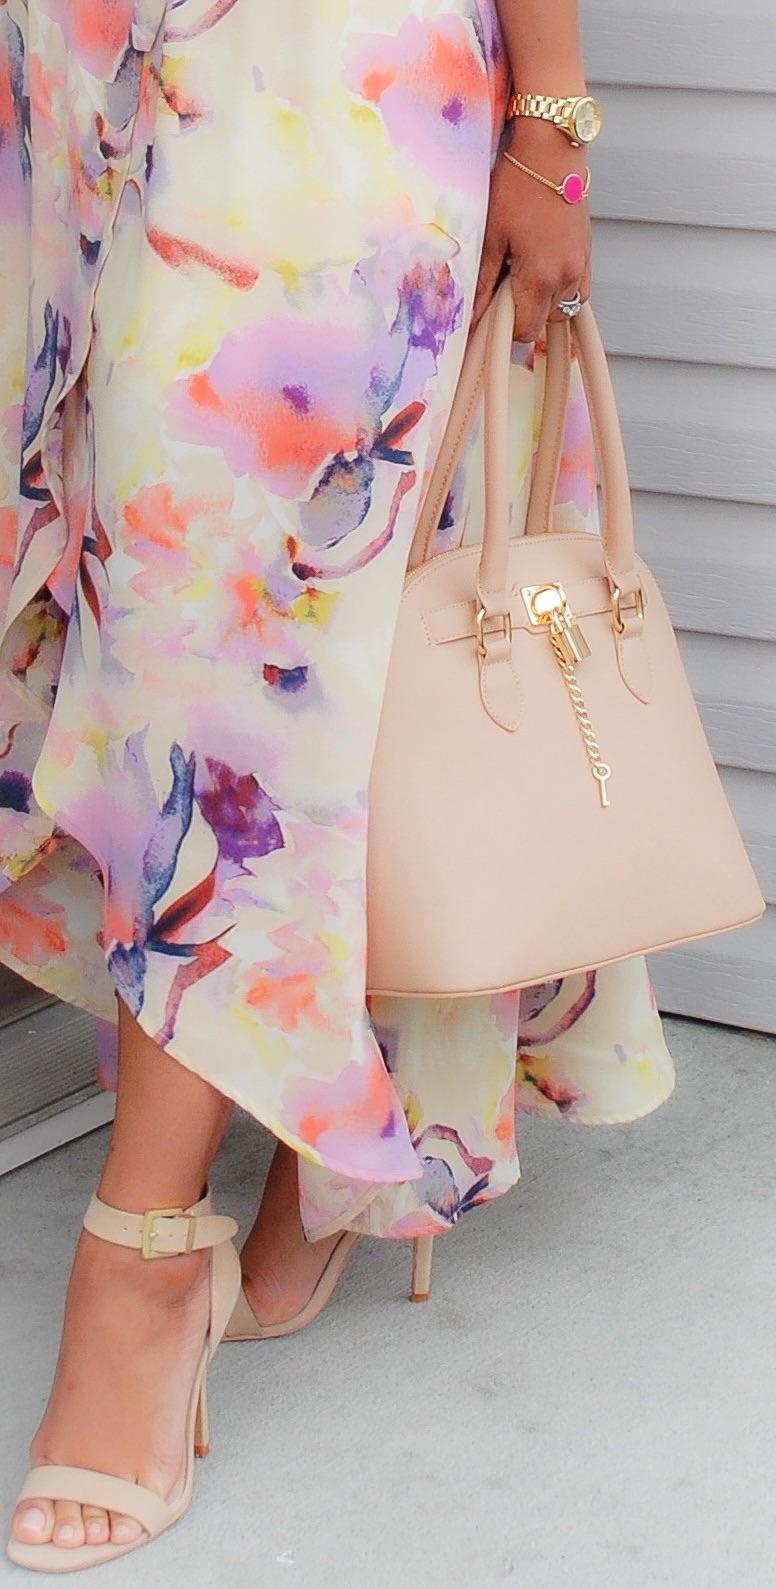 This Season's Gold // Blush Handbag and Sandals